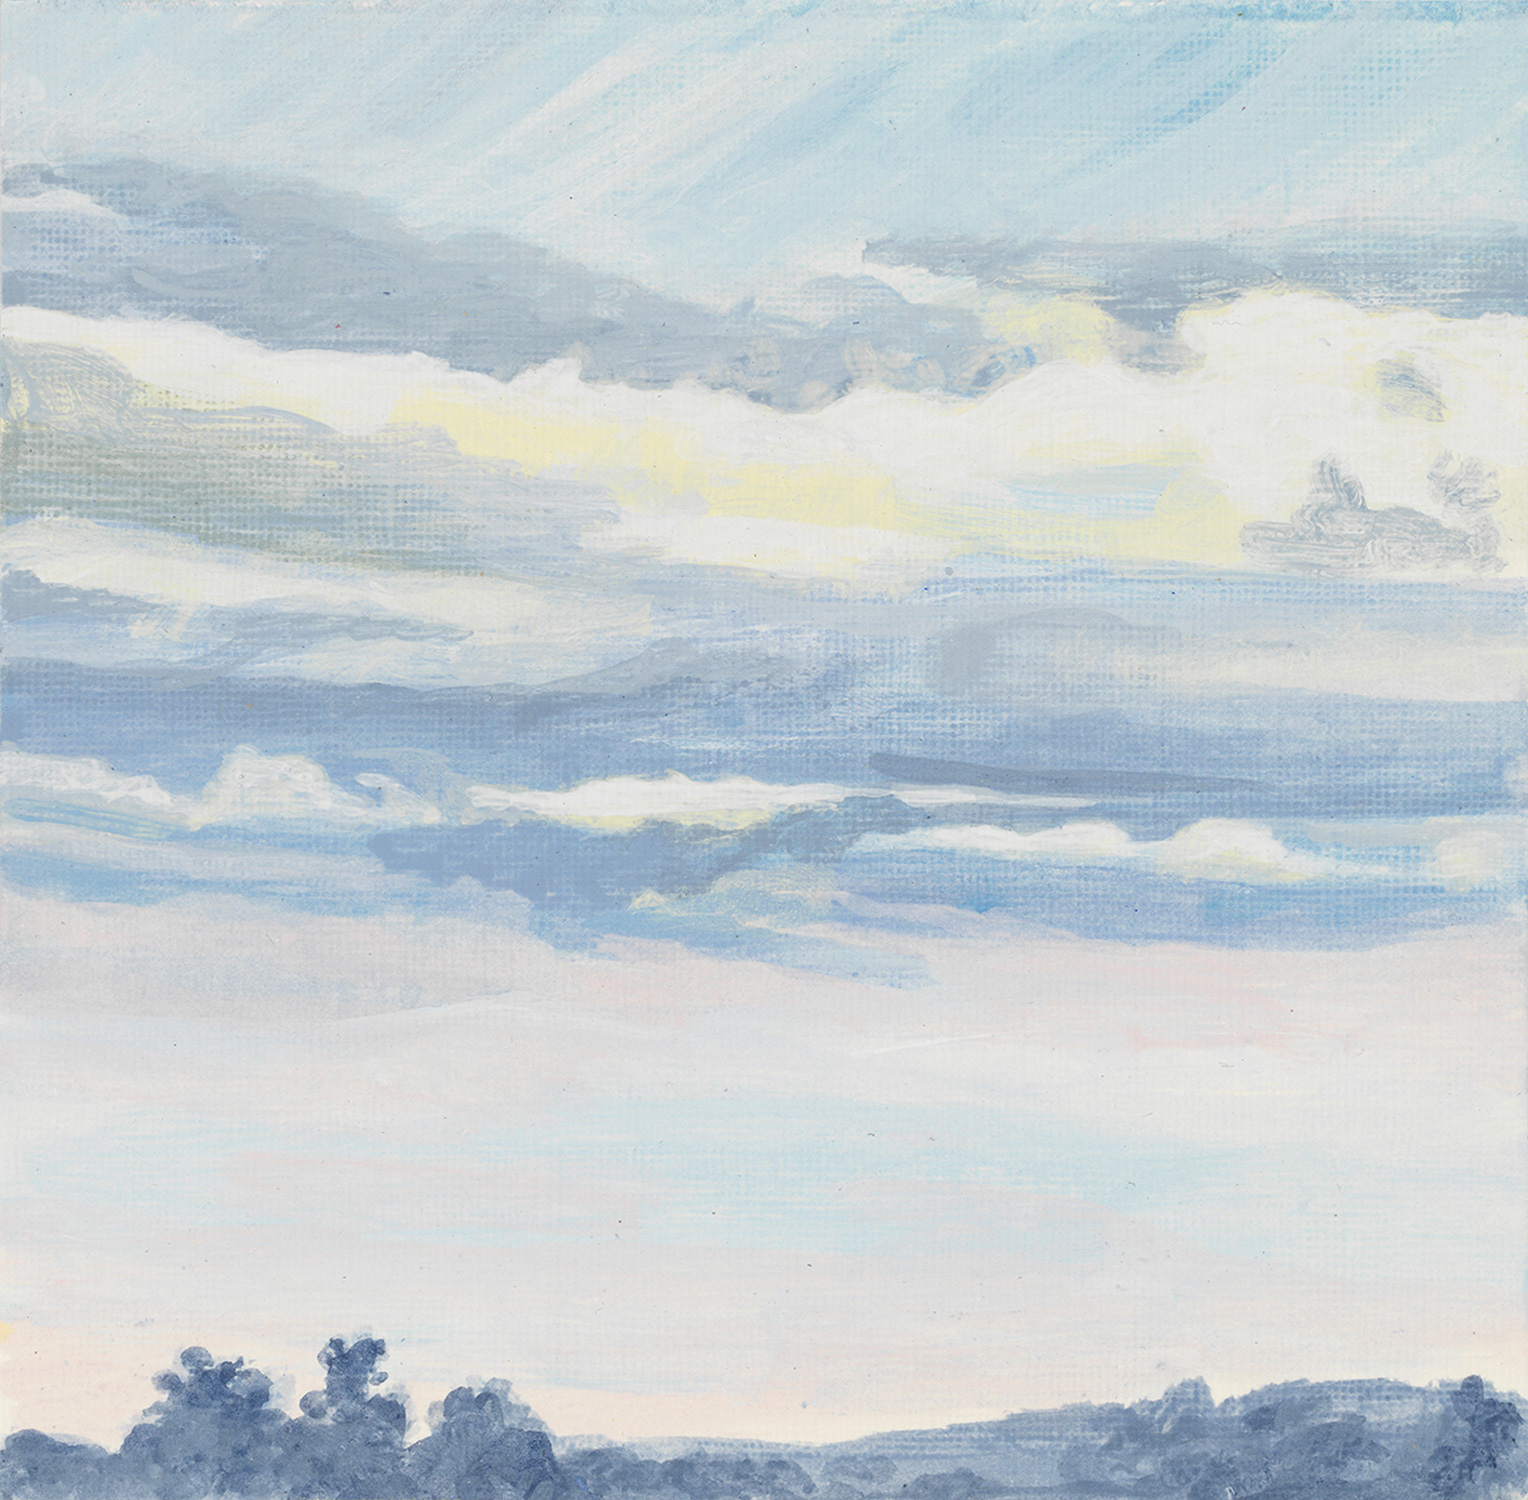 "Krems AIR 8, 2017, acrylic on paper, 6"" x 6"""